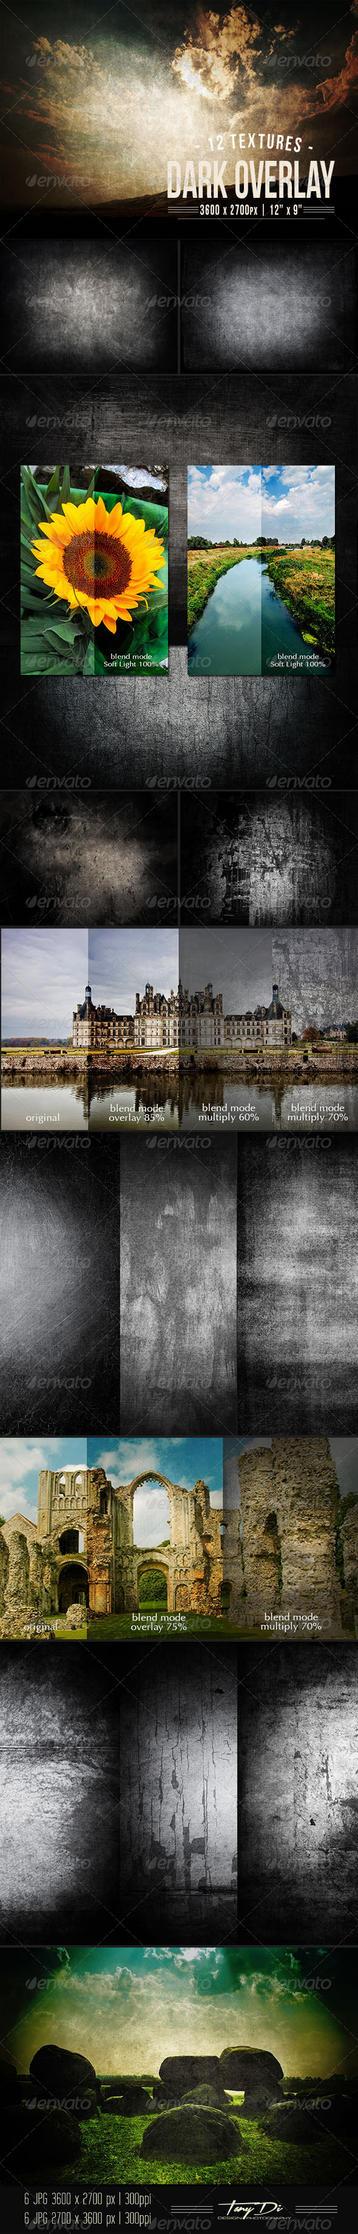 Dark Overlay Textures by AzureRayArt